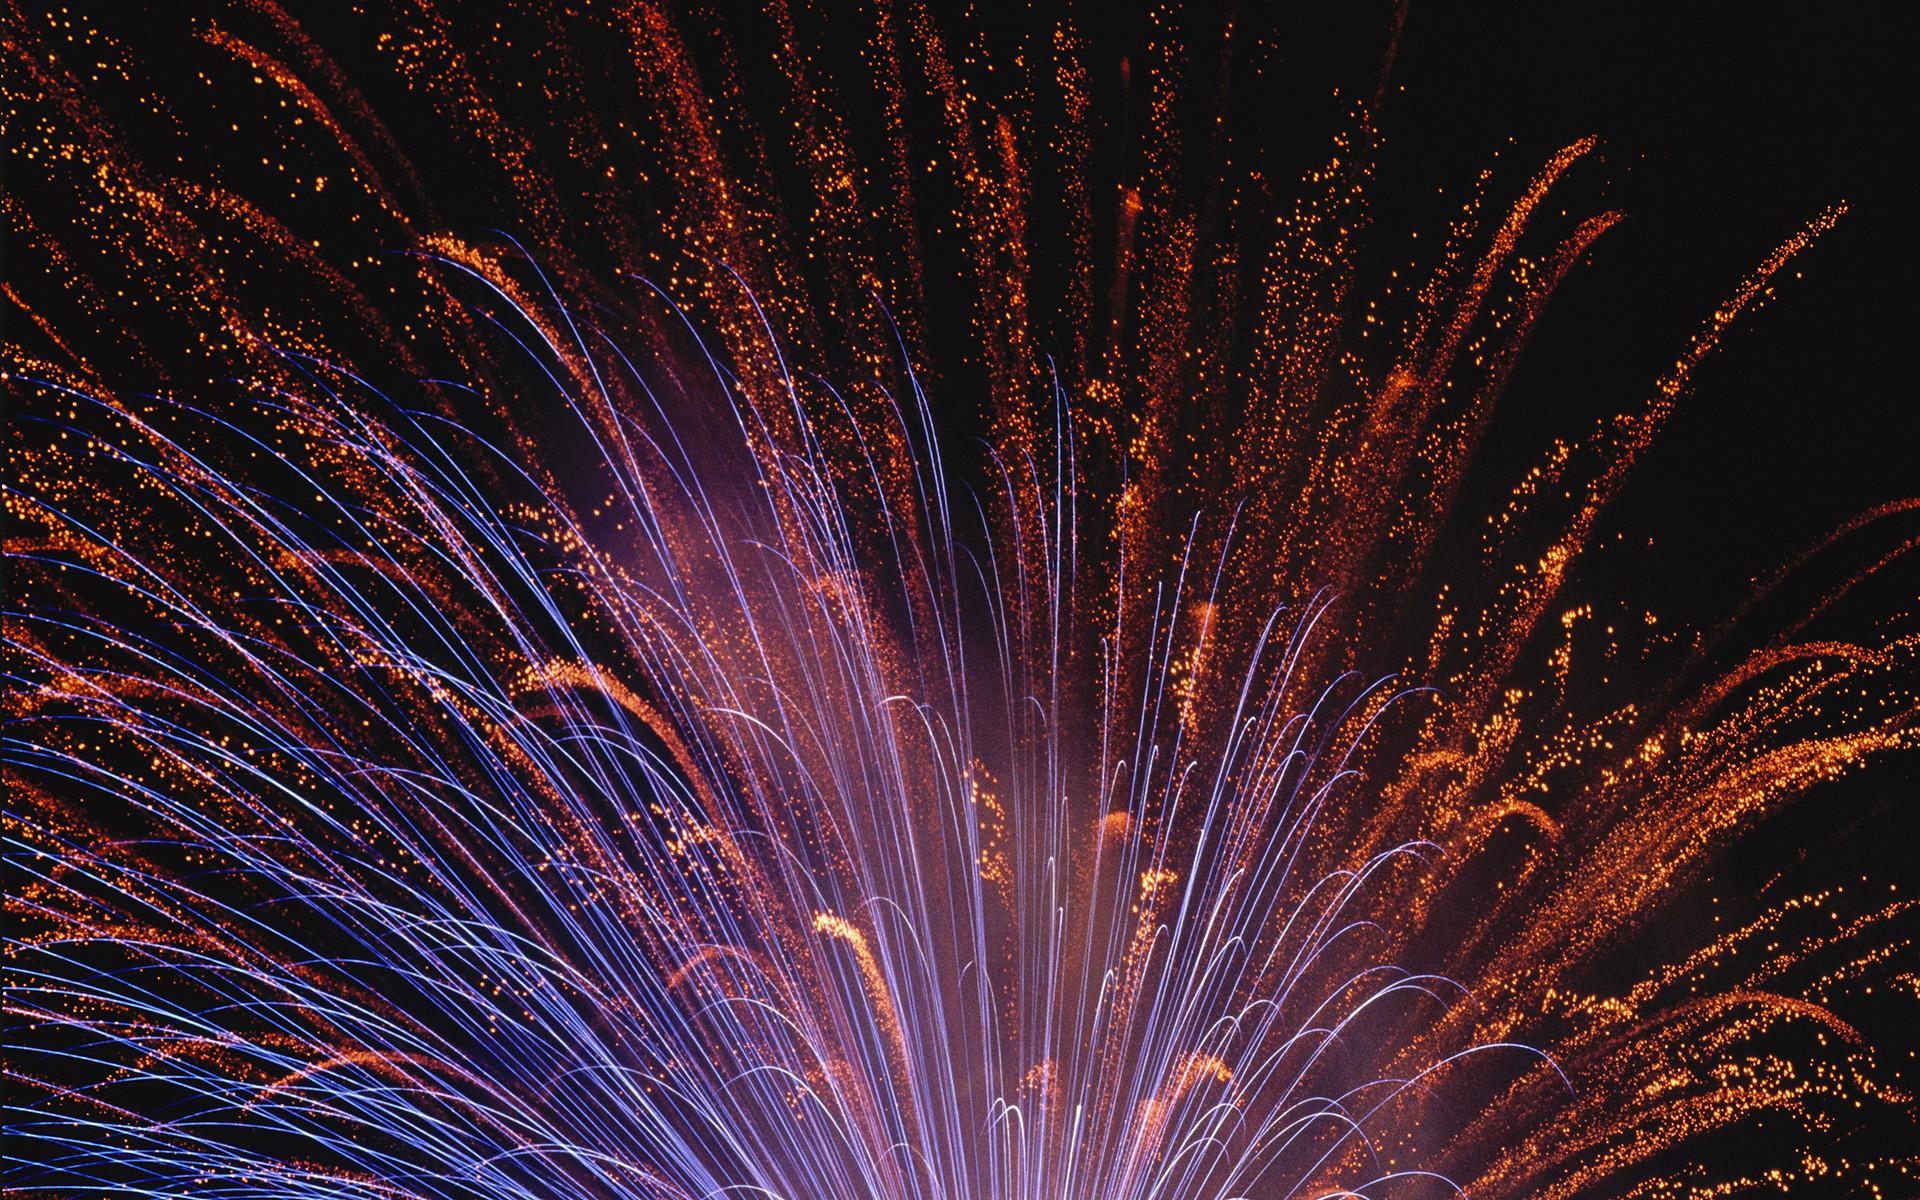 Fireworks Wallpaper Free: Fireworks Desktop Wallpaper